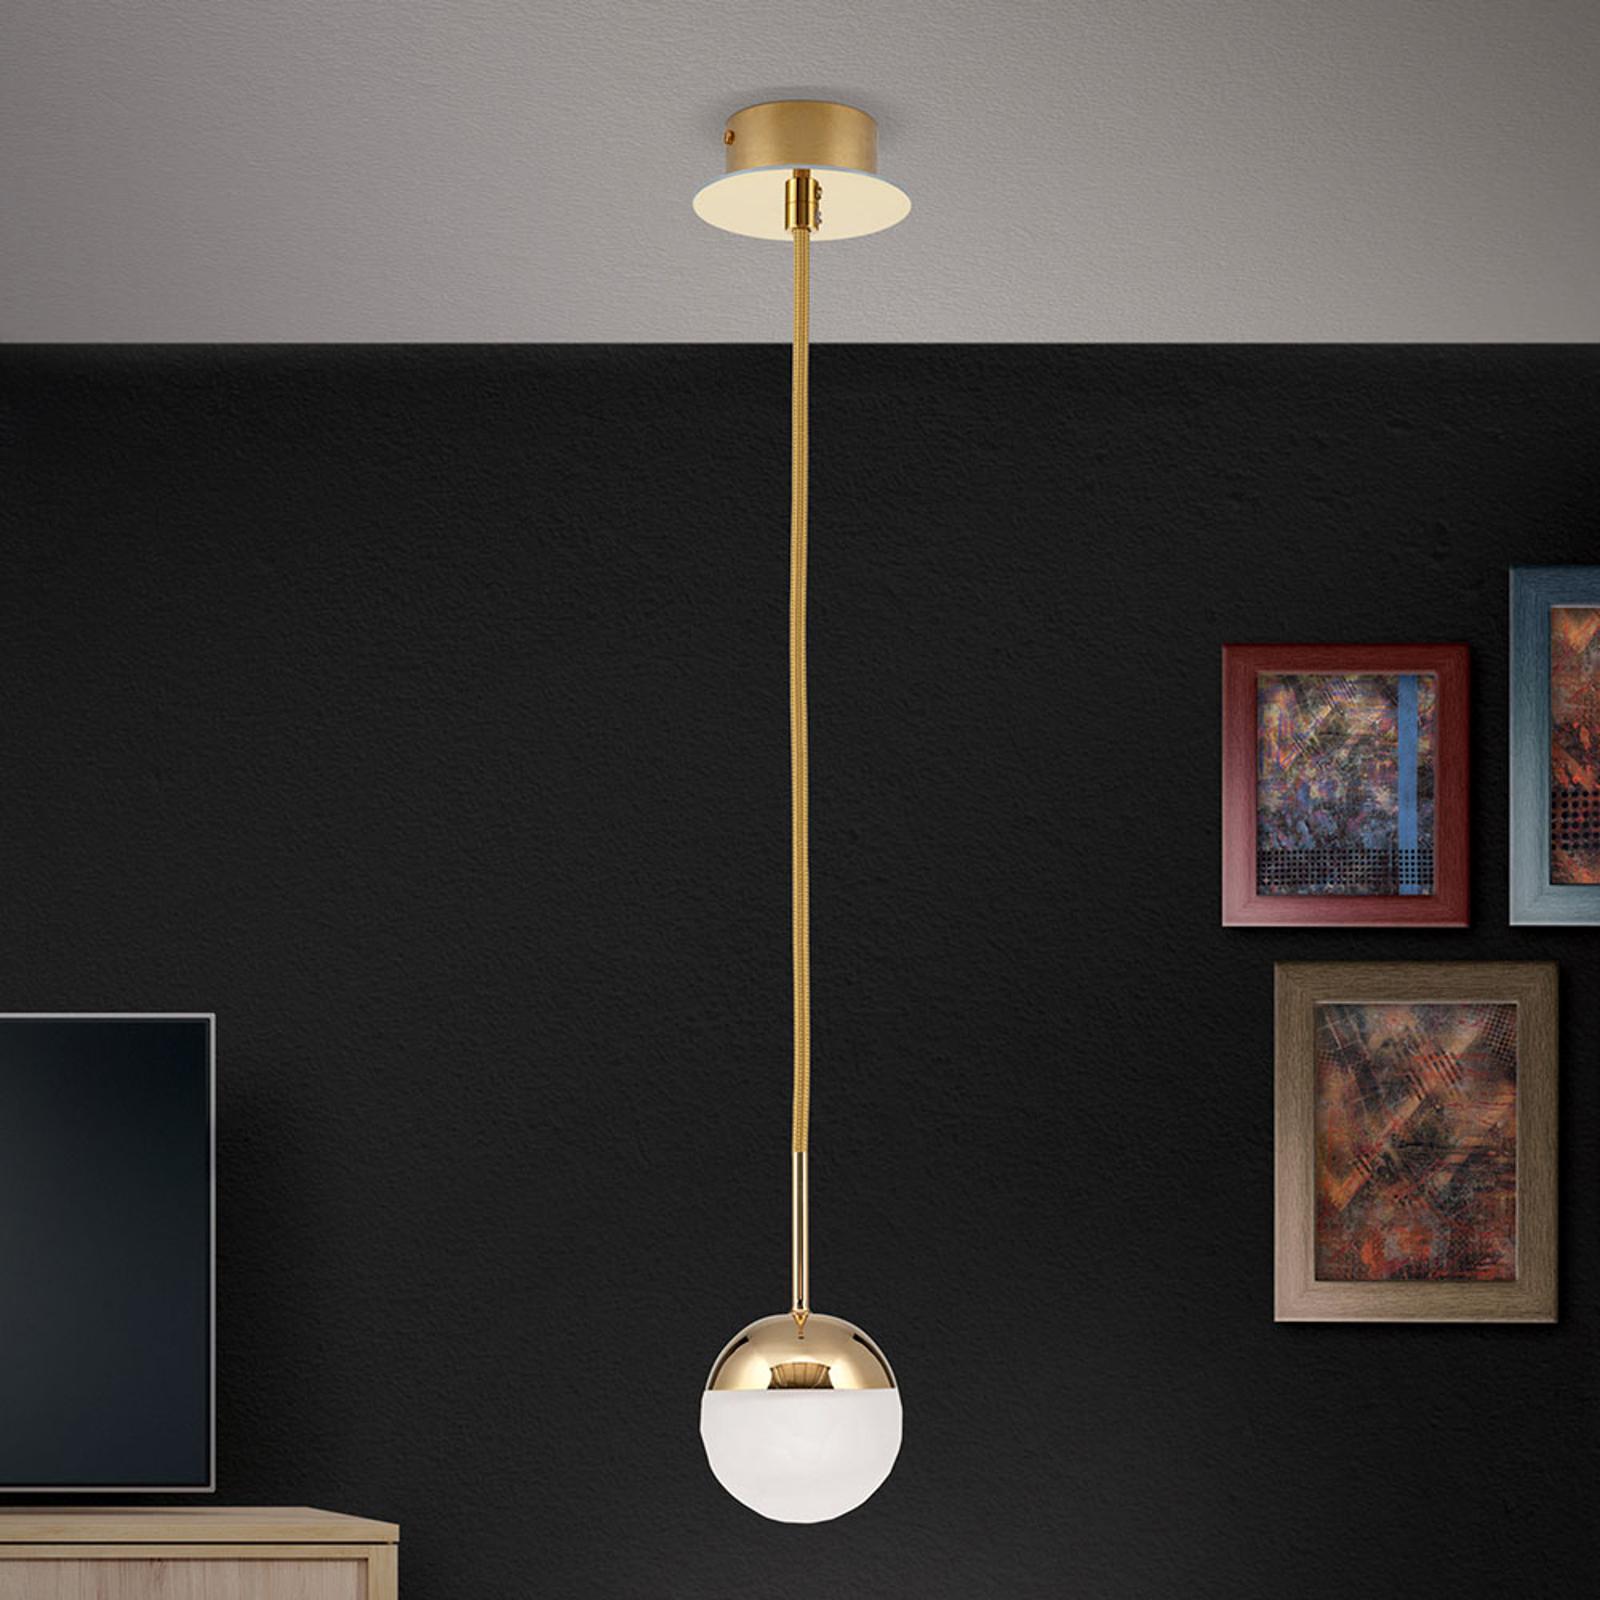 LED hanglamp Ball, 1-lamp, goud